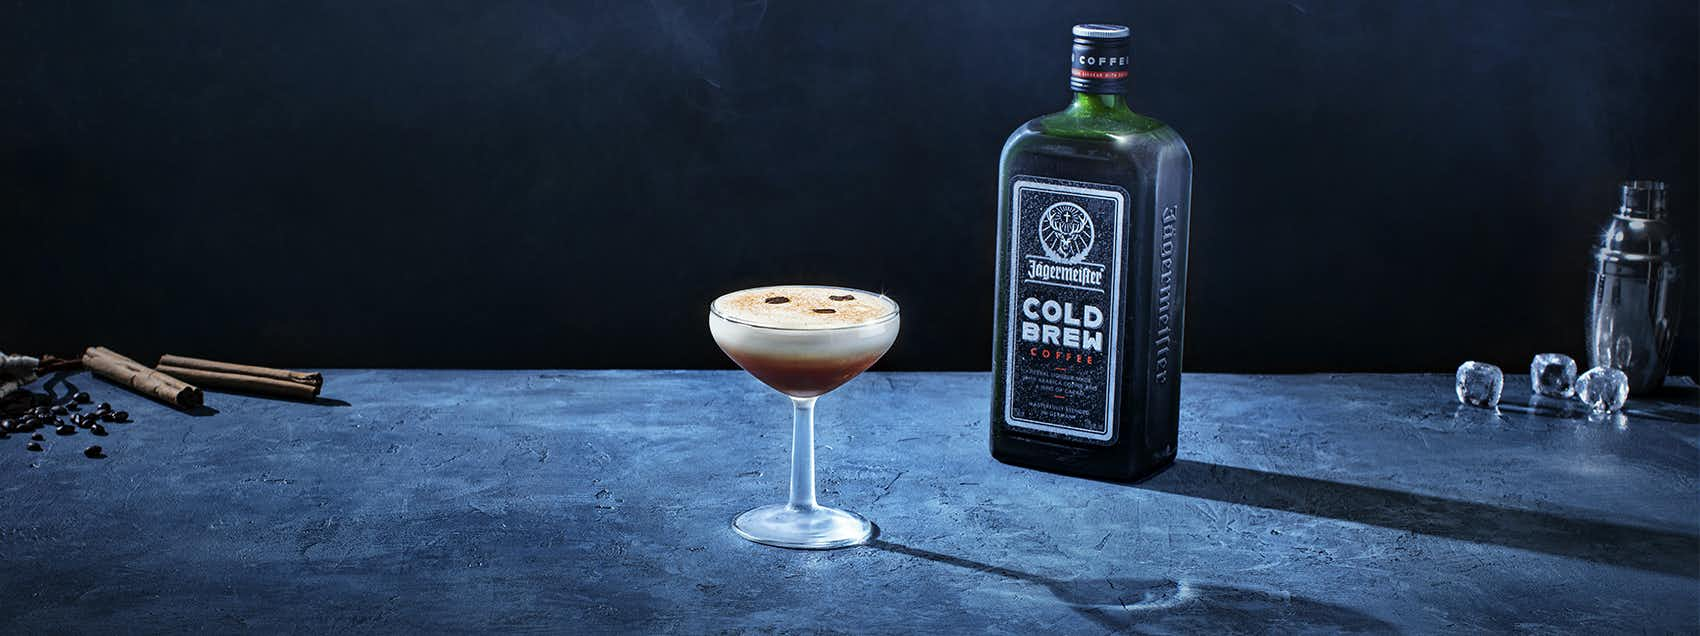 Jägermeister Cold Brew Martini